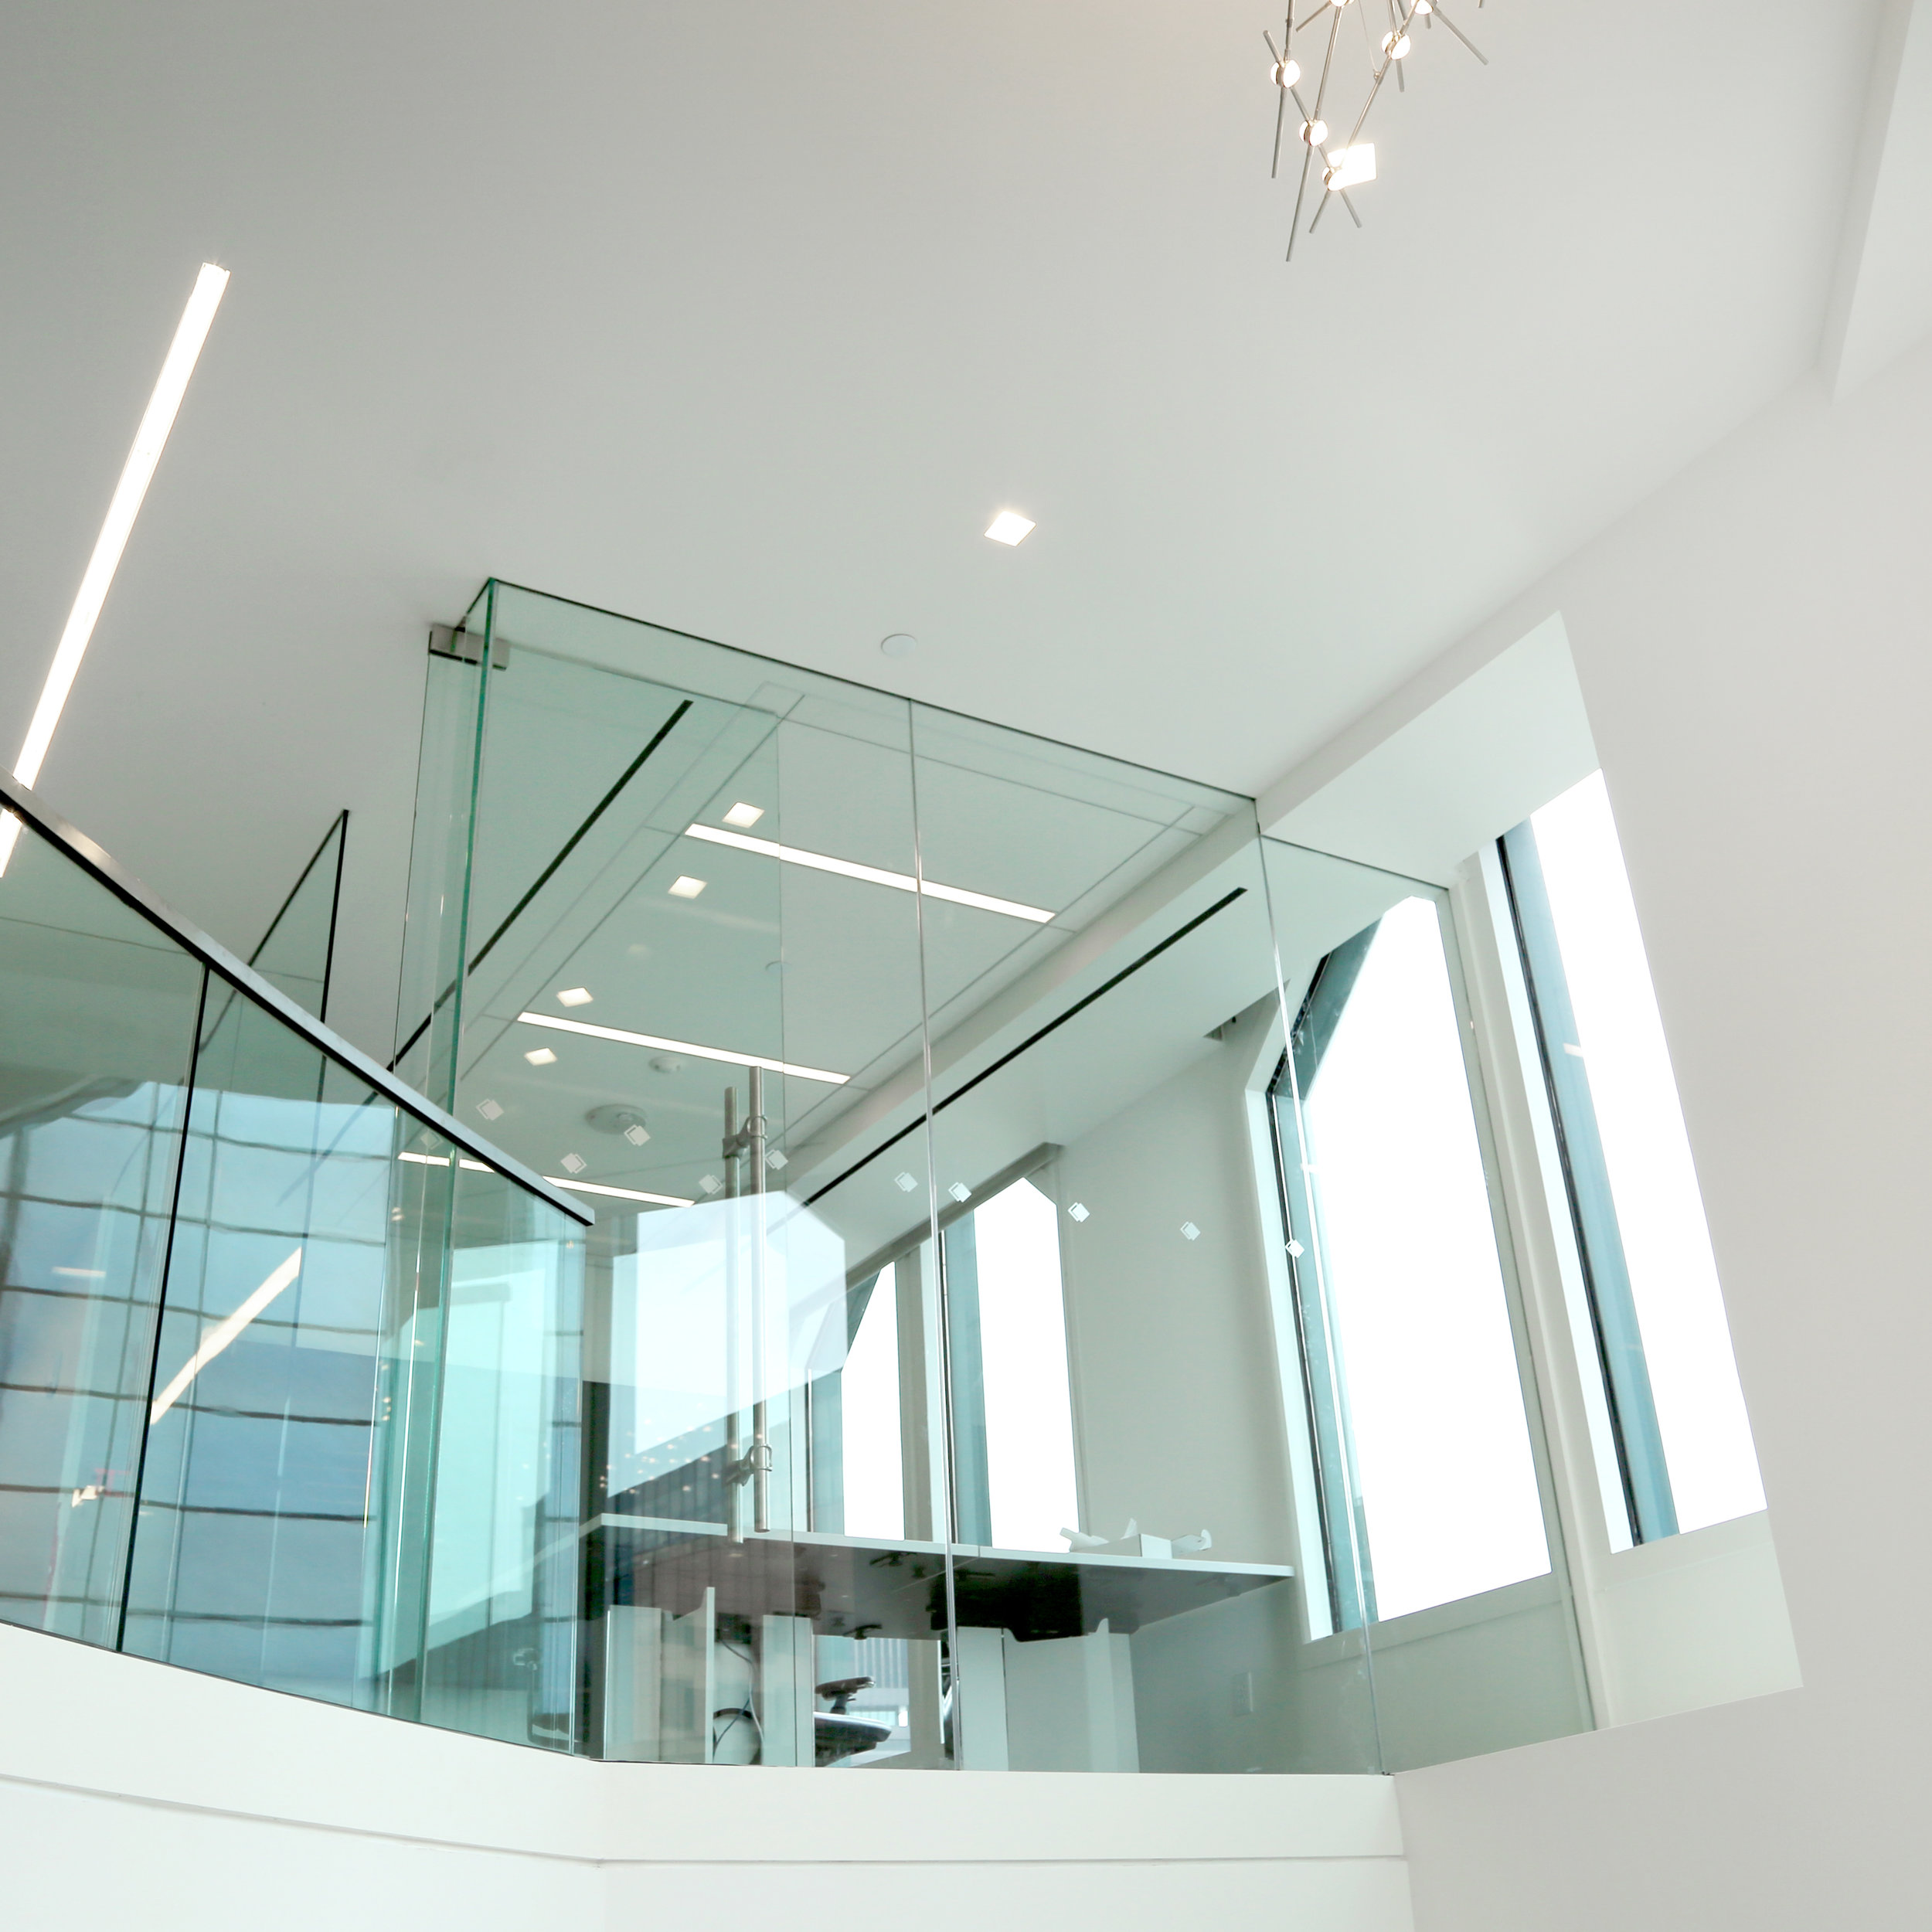 Frameless Glass Office Wall Over Open Stair - Spaceworks AI.jpg